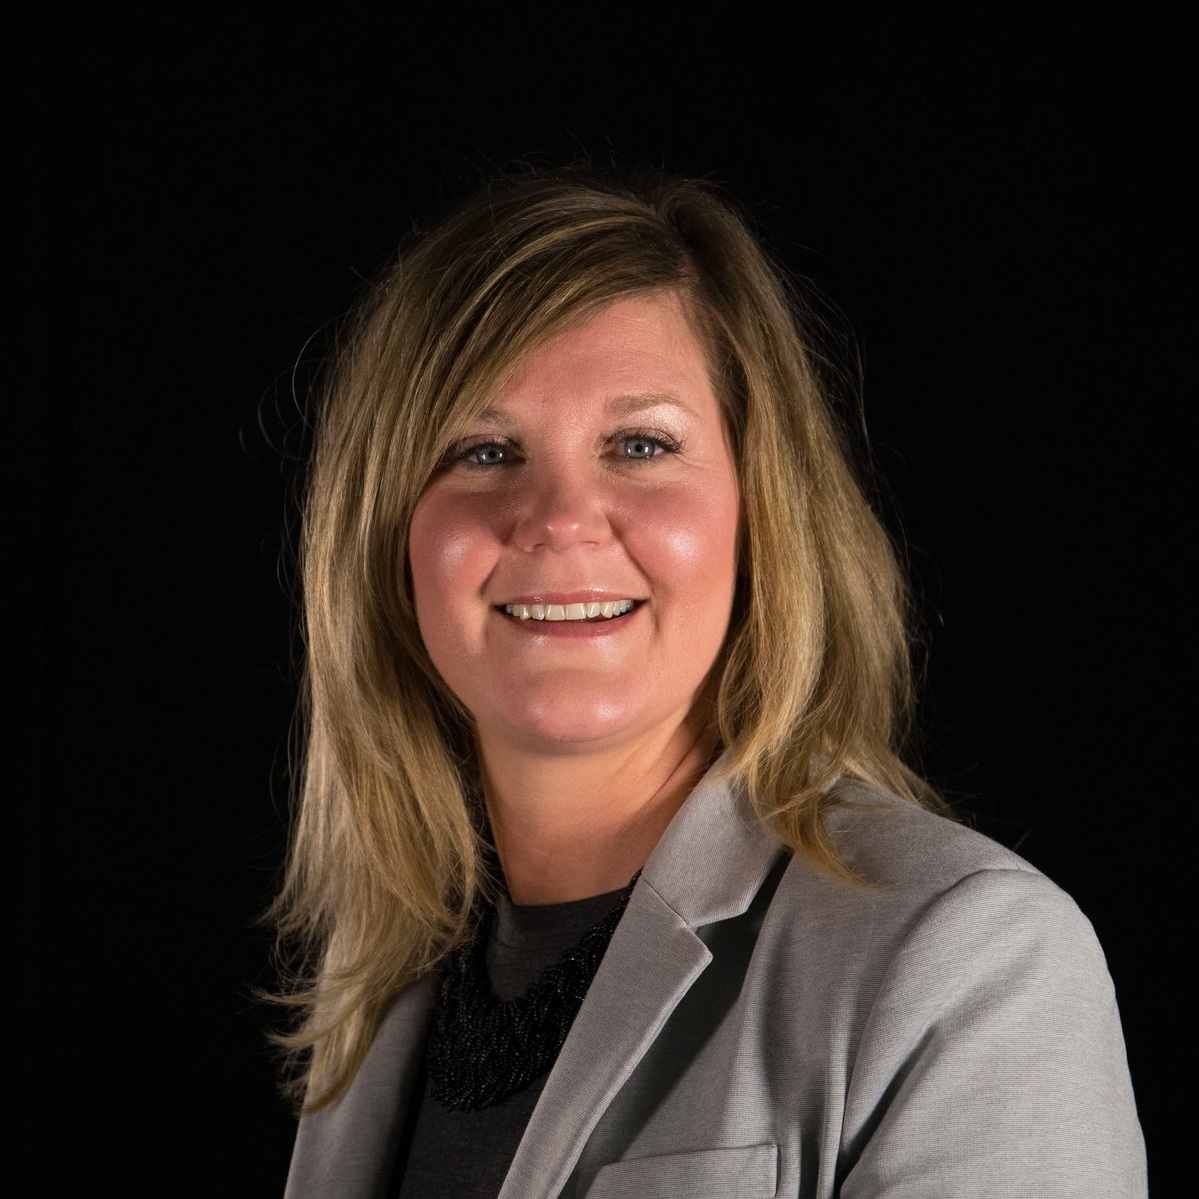 Jill Lowell, Clinical Coordinator